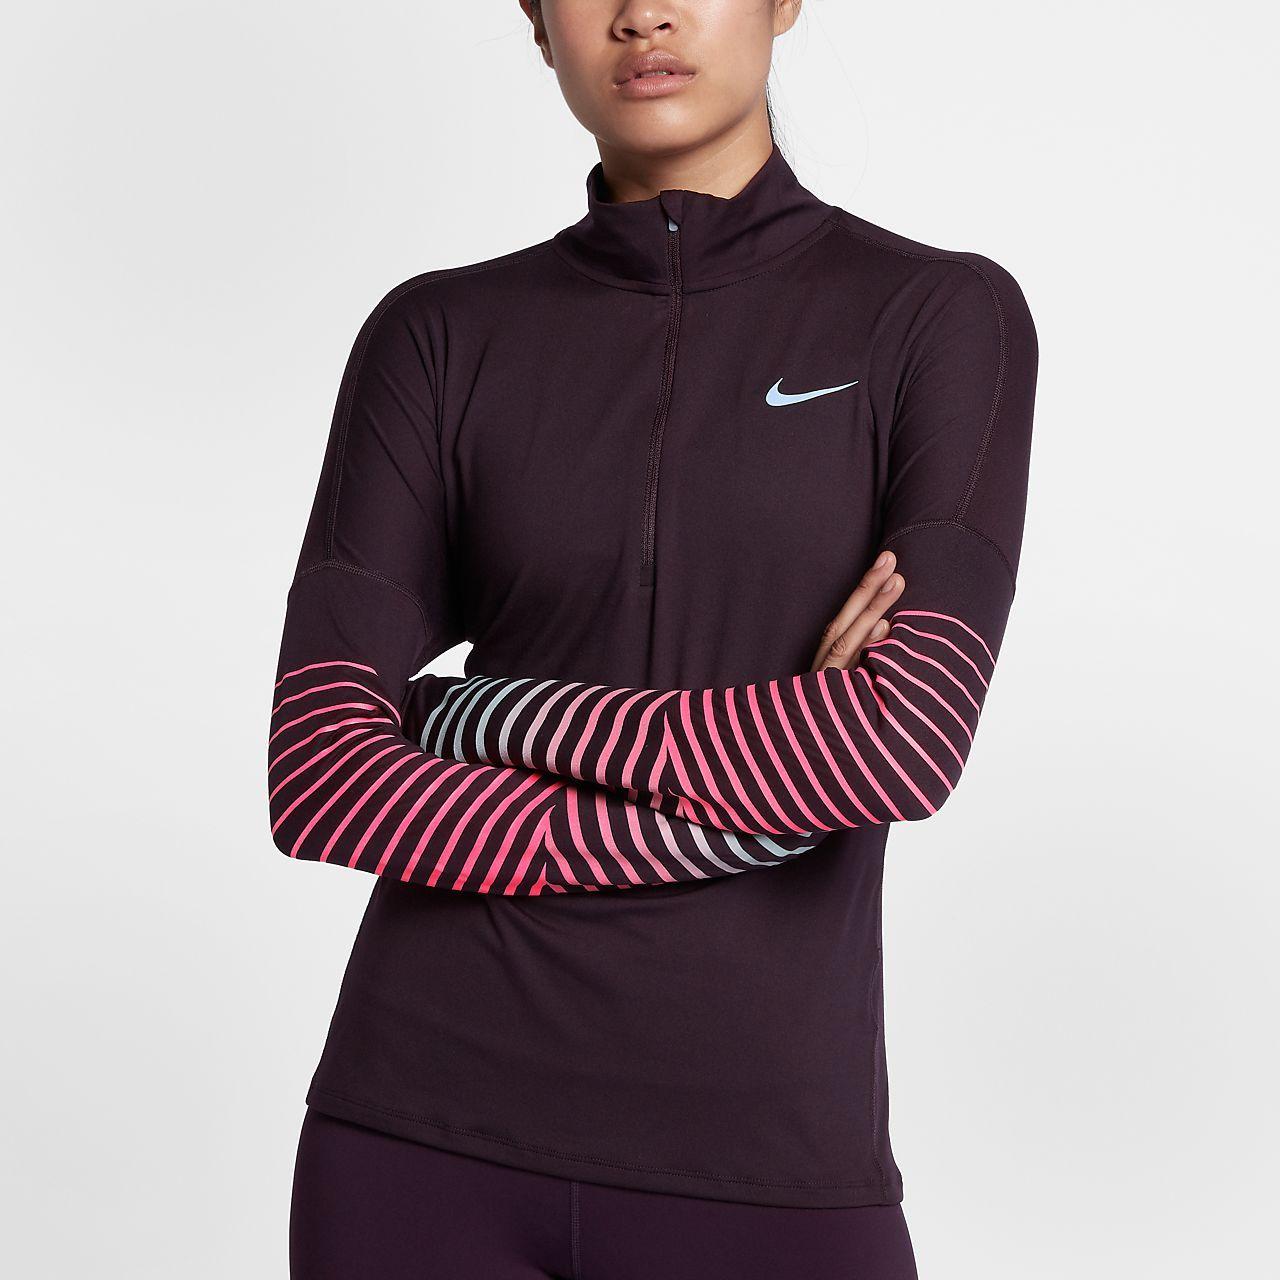 Nike Element Flash Women's Reflective